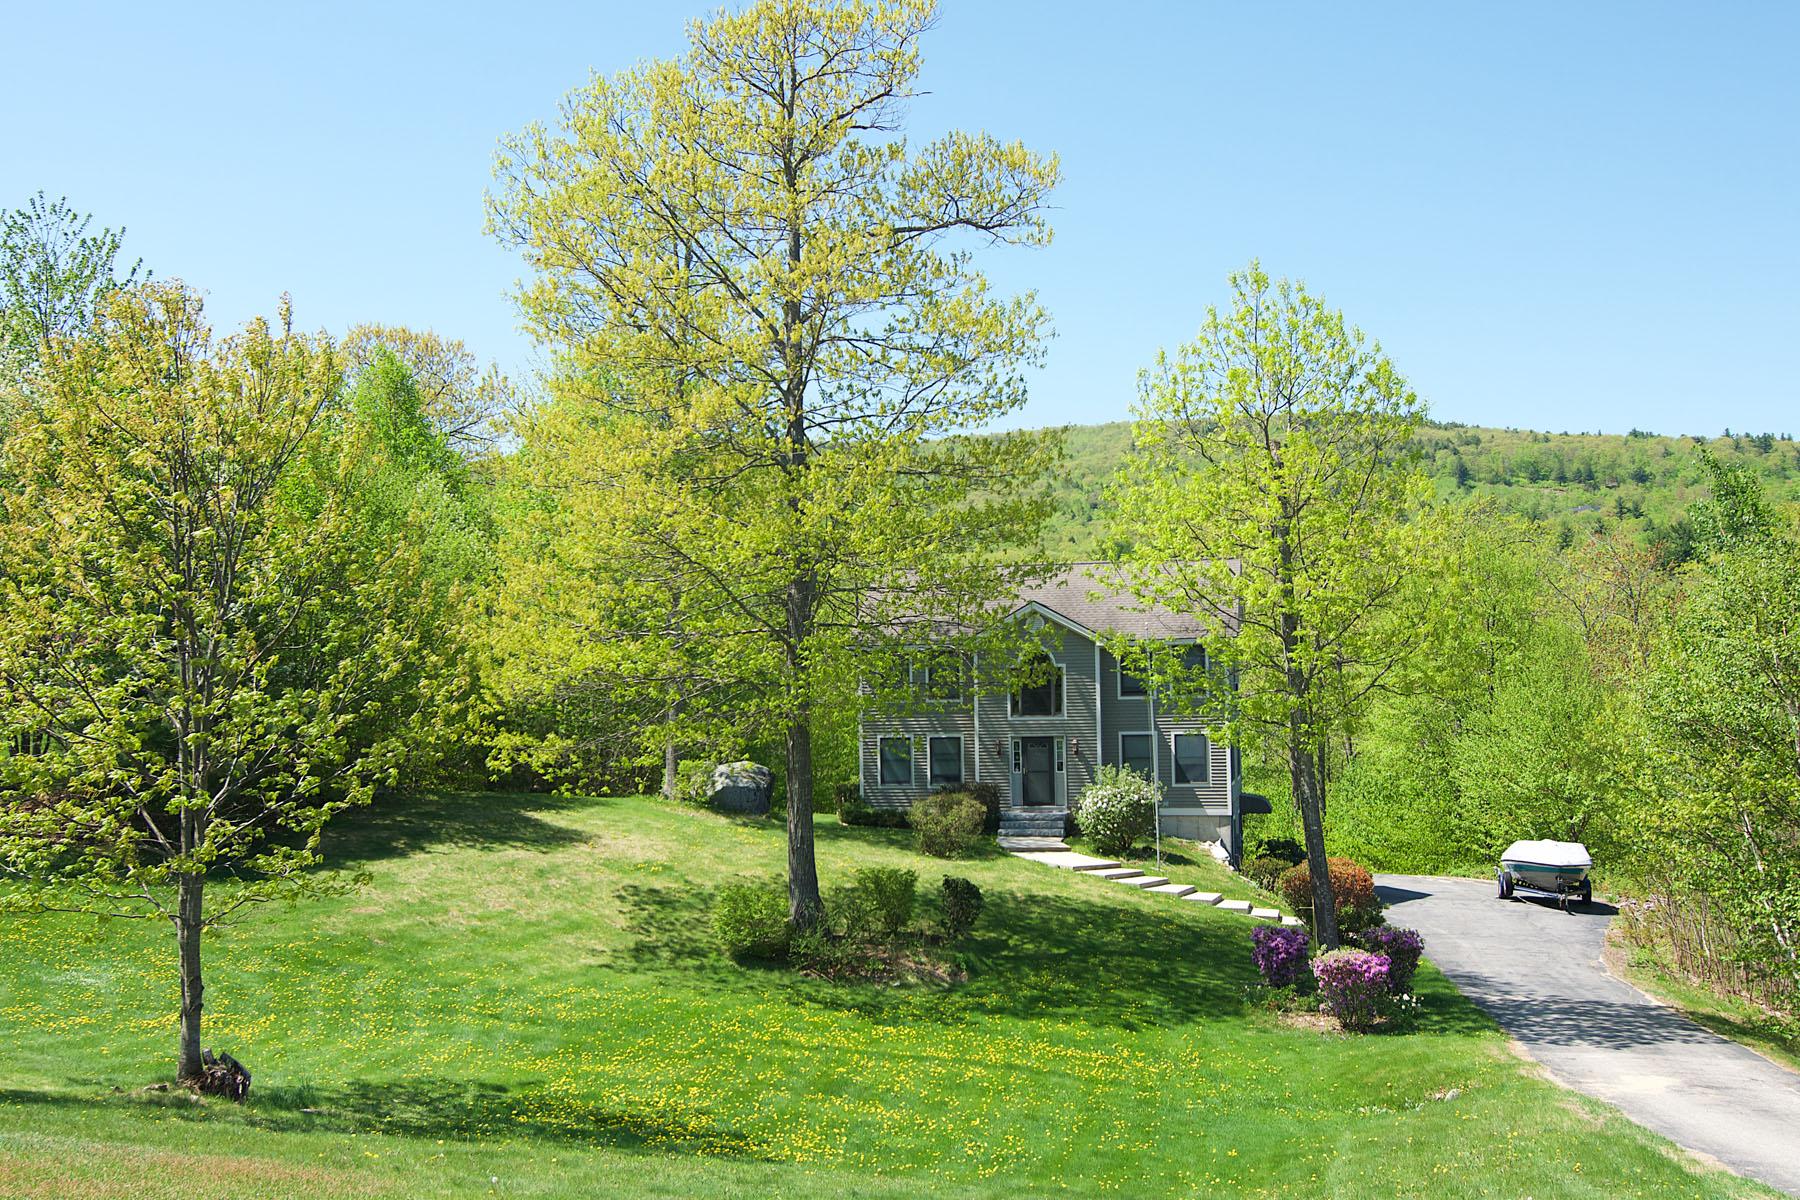 Single Family Home for Sale at 74 Lakewood Drive, Alton Alton, New Hampshire, 03810 United States